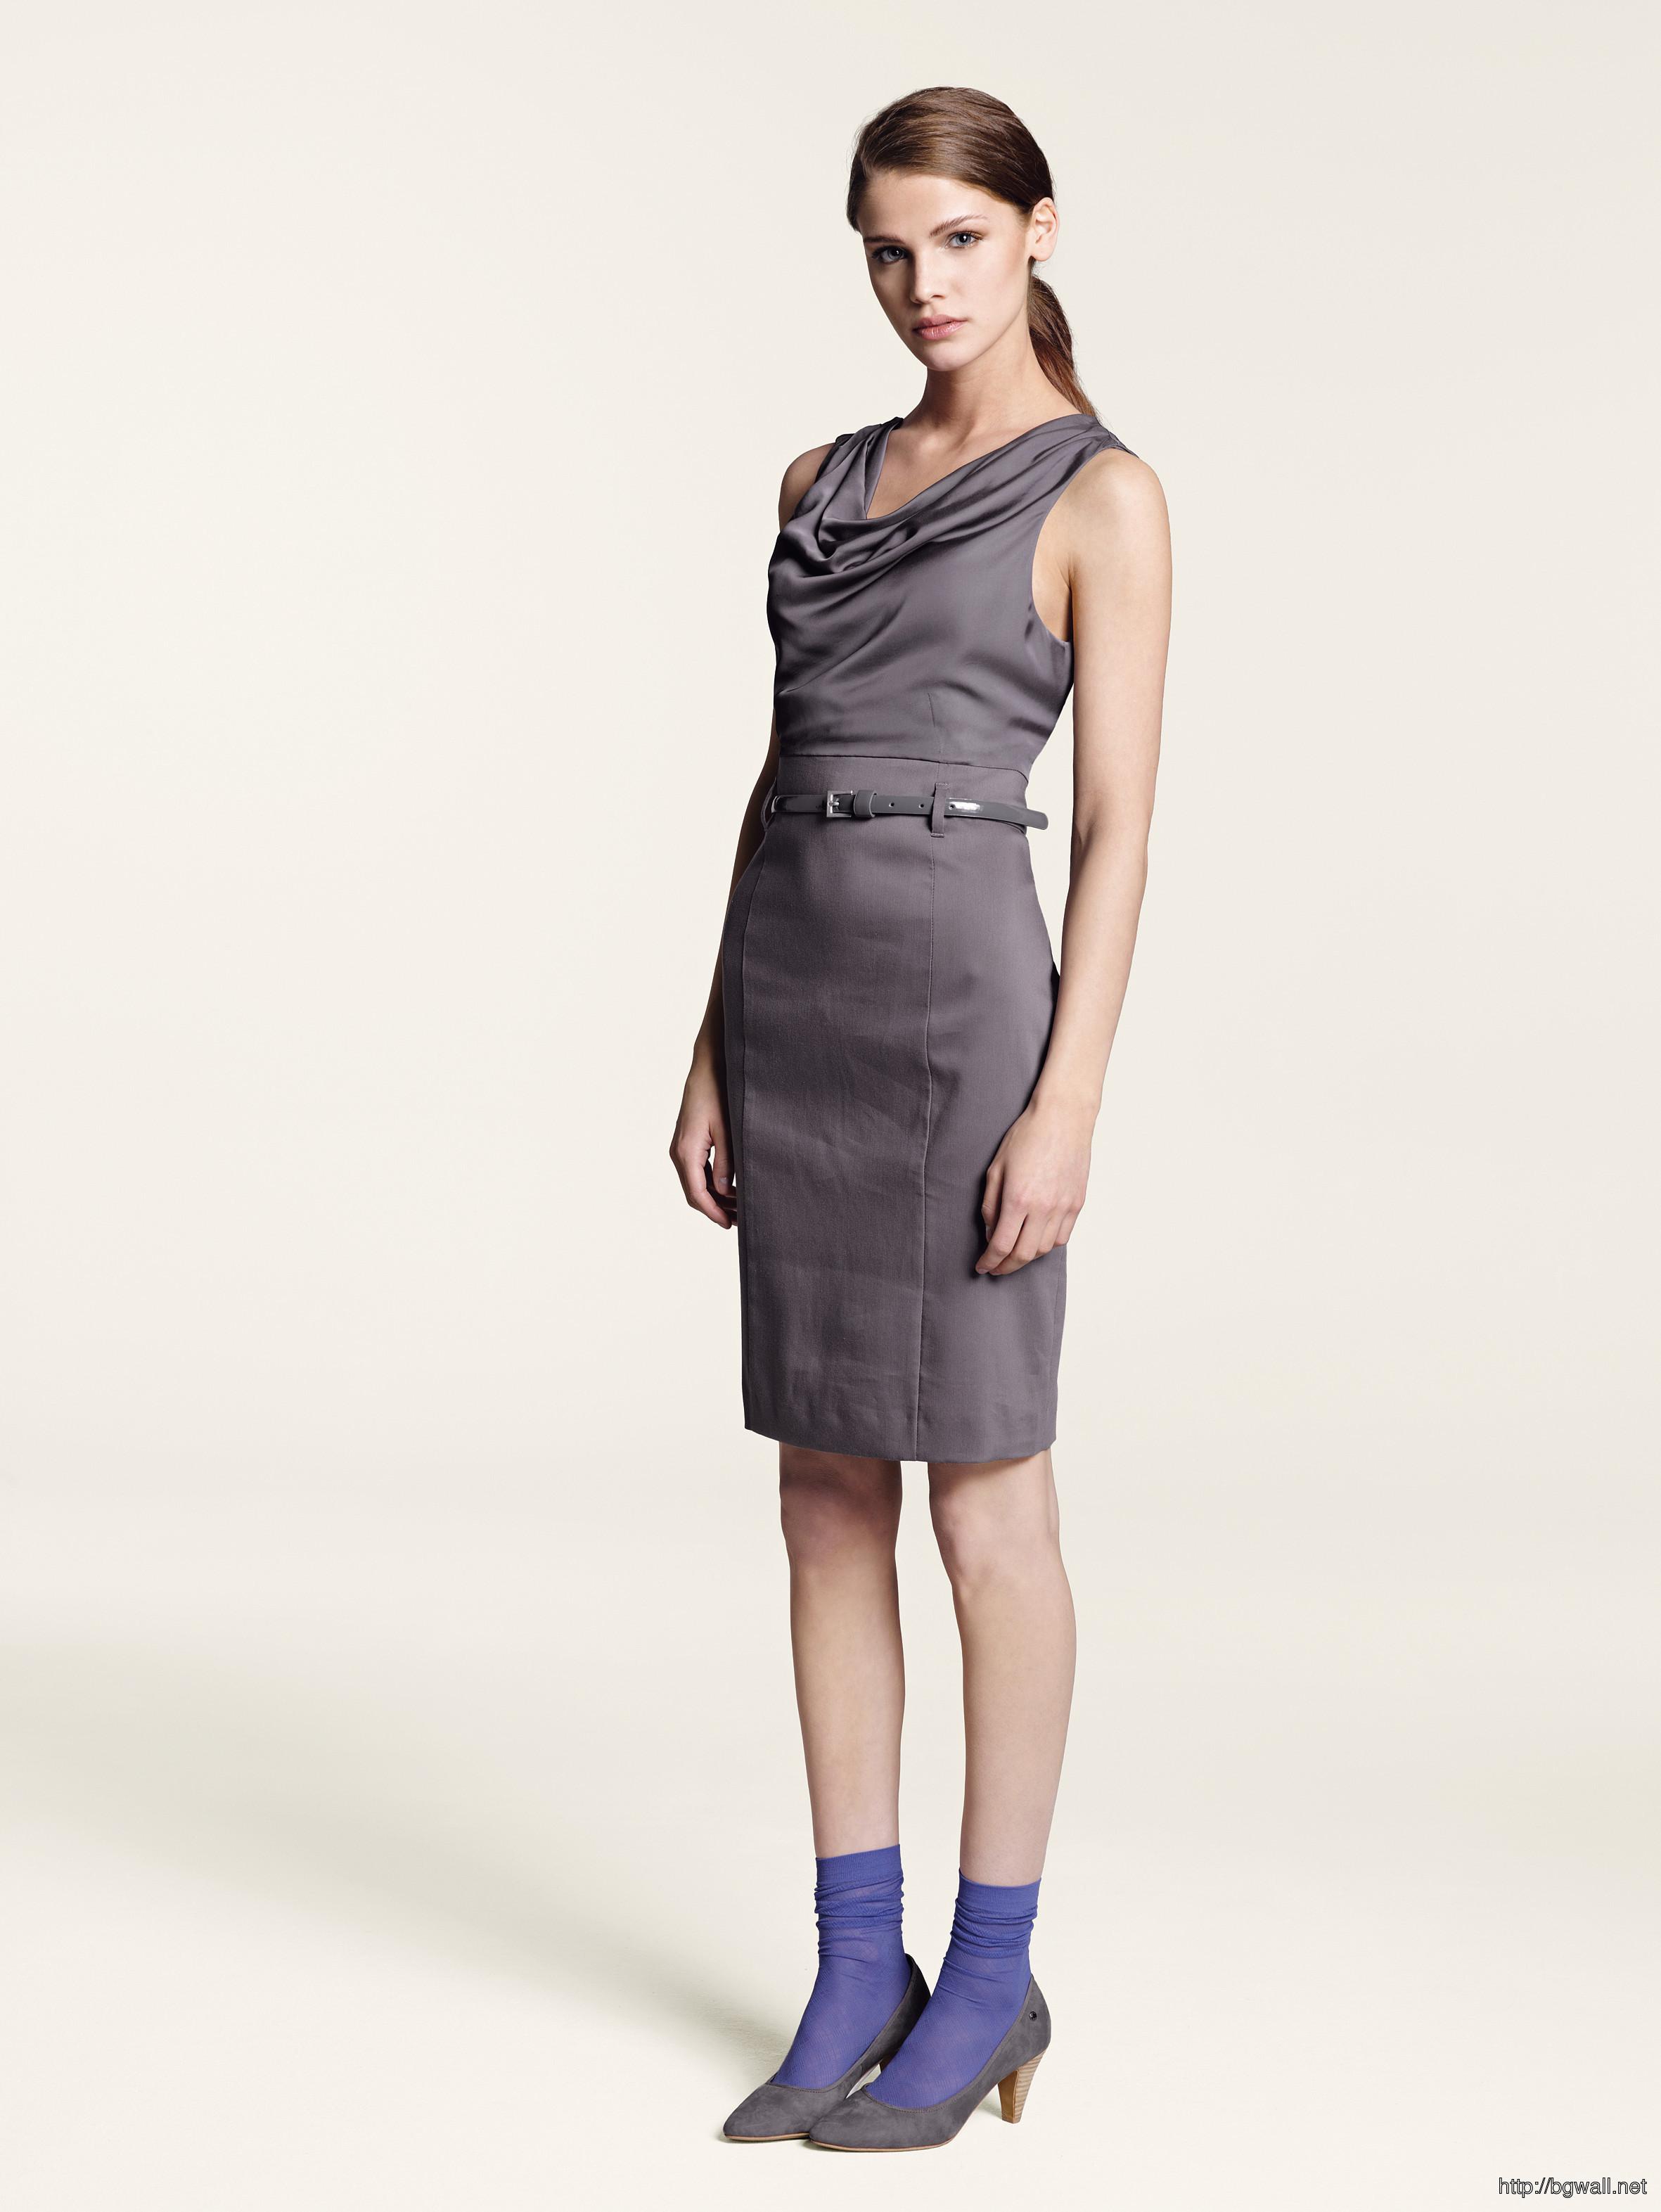 Lisa Tomaschewsky 10 Full Size